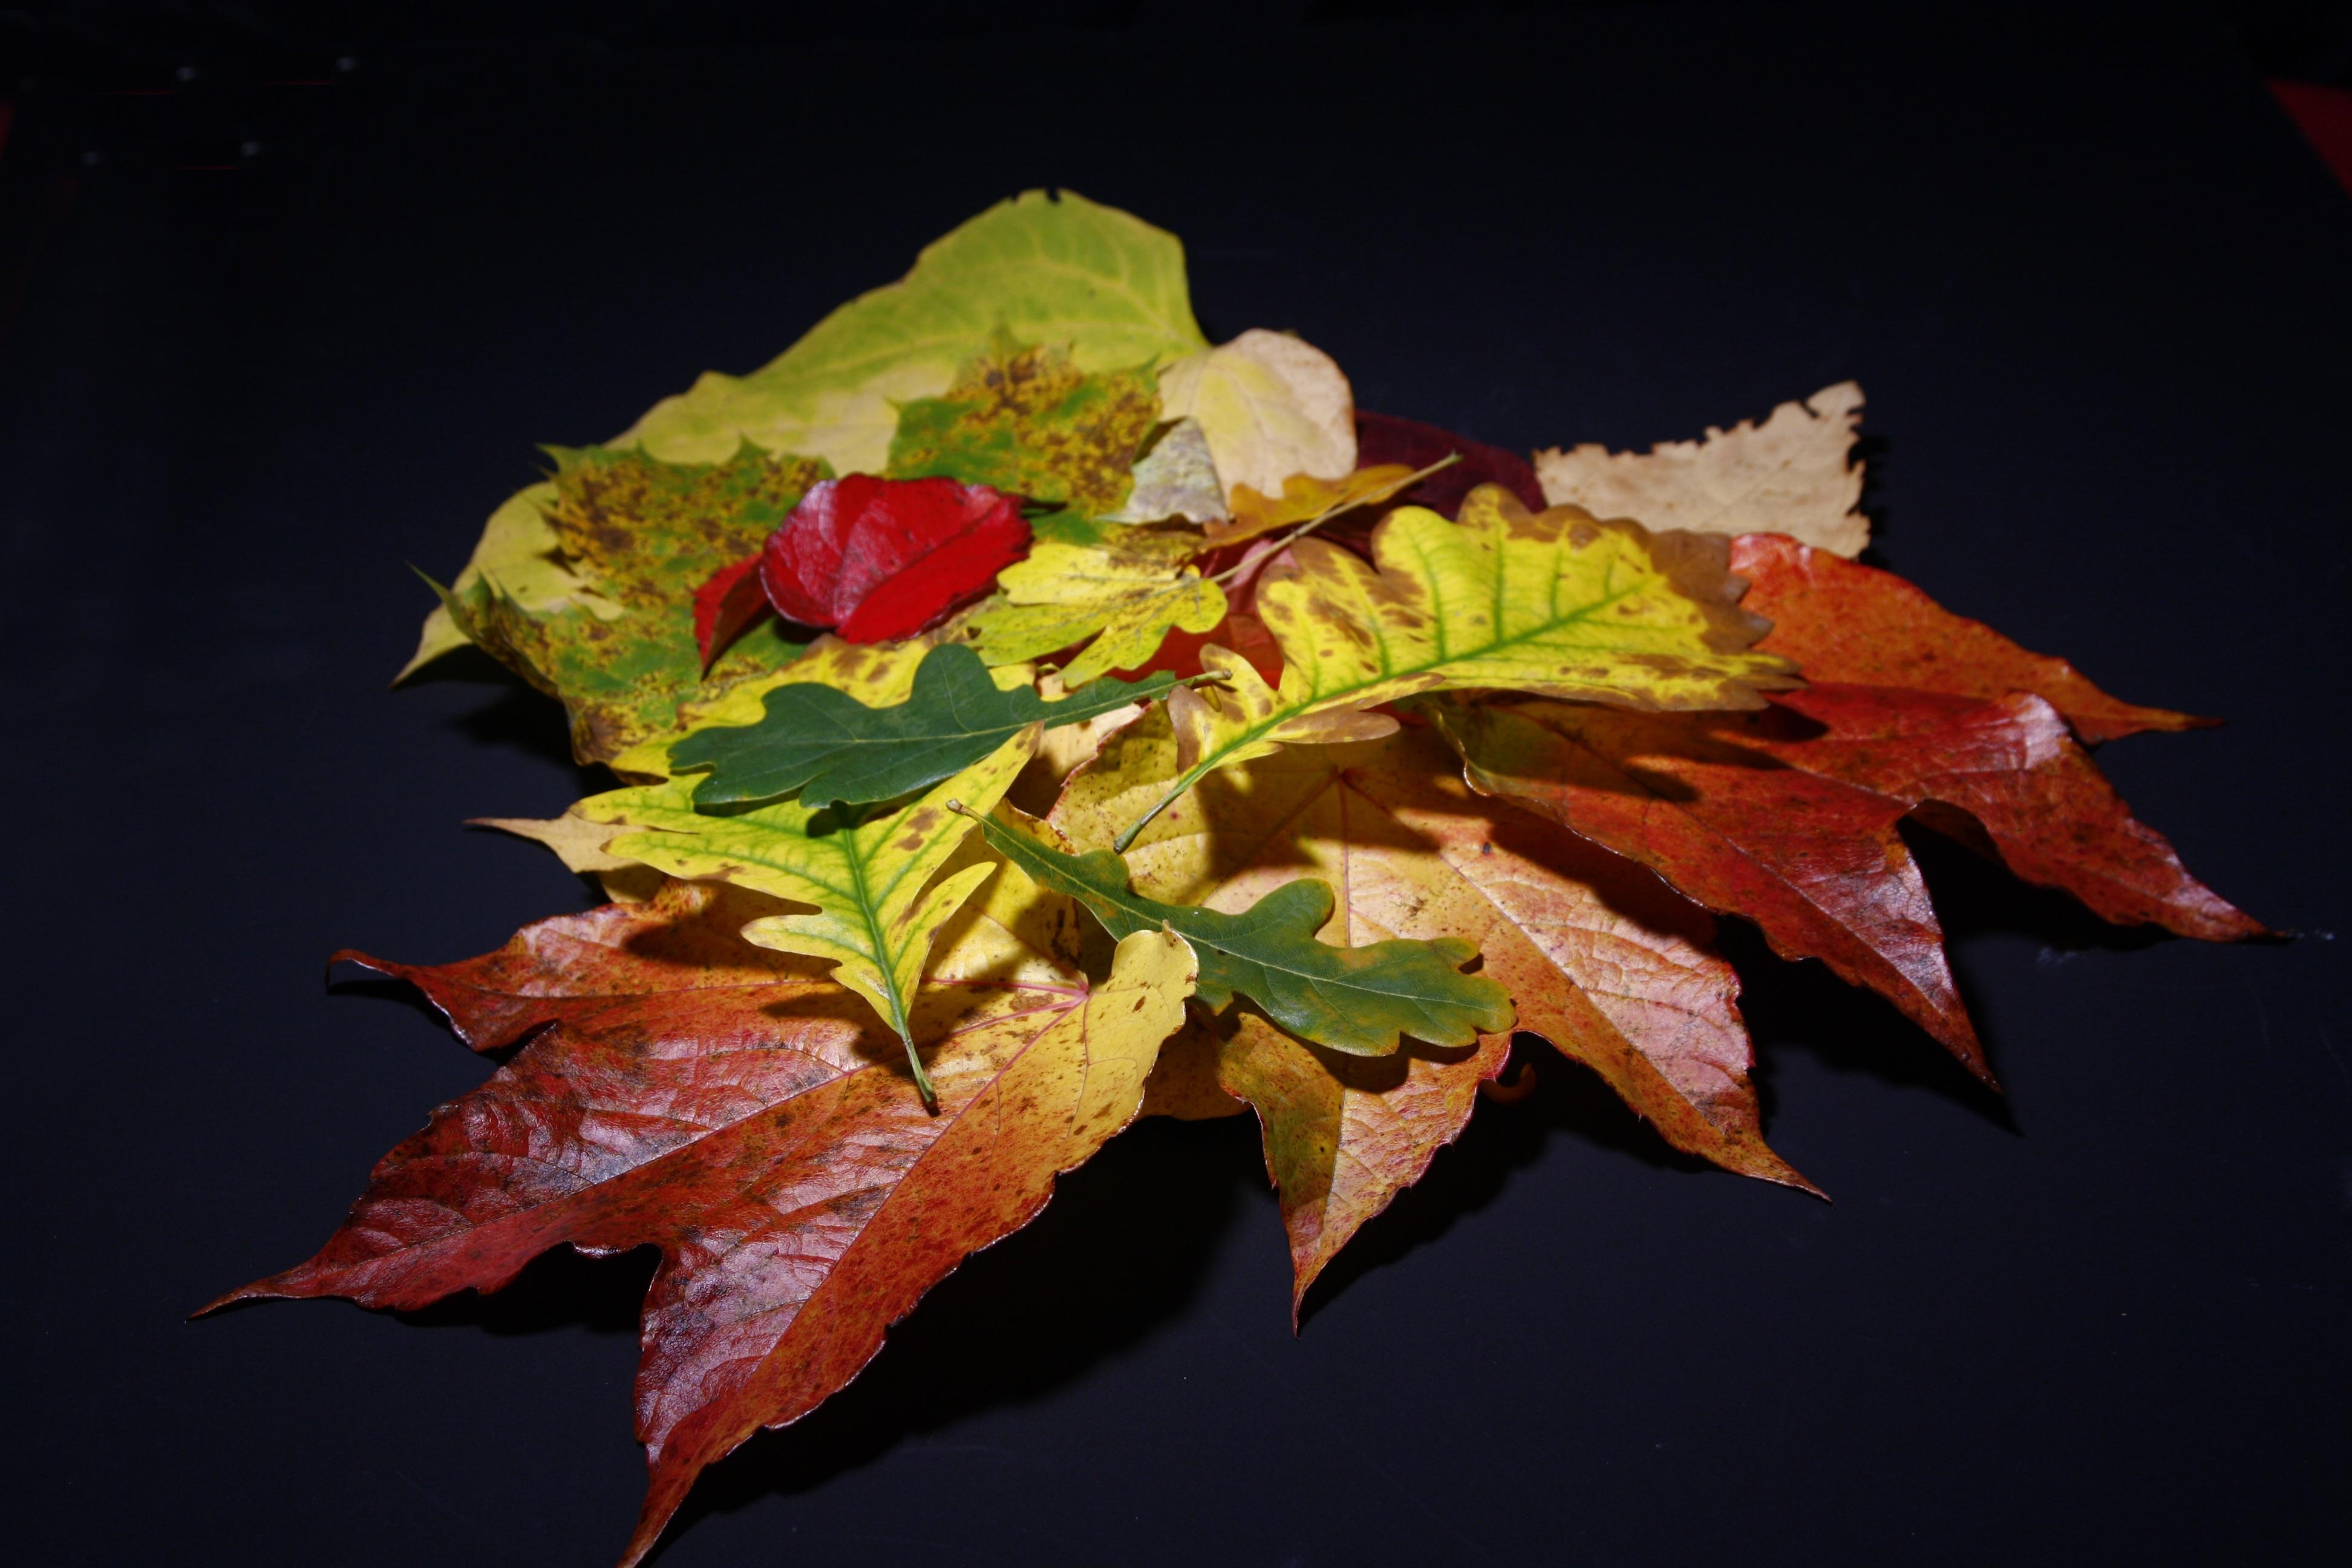 Kostenlose foto : Baum, Ast, Blatt, Blume, Blütenblatt, Grün, rot ...